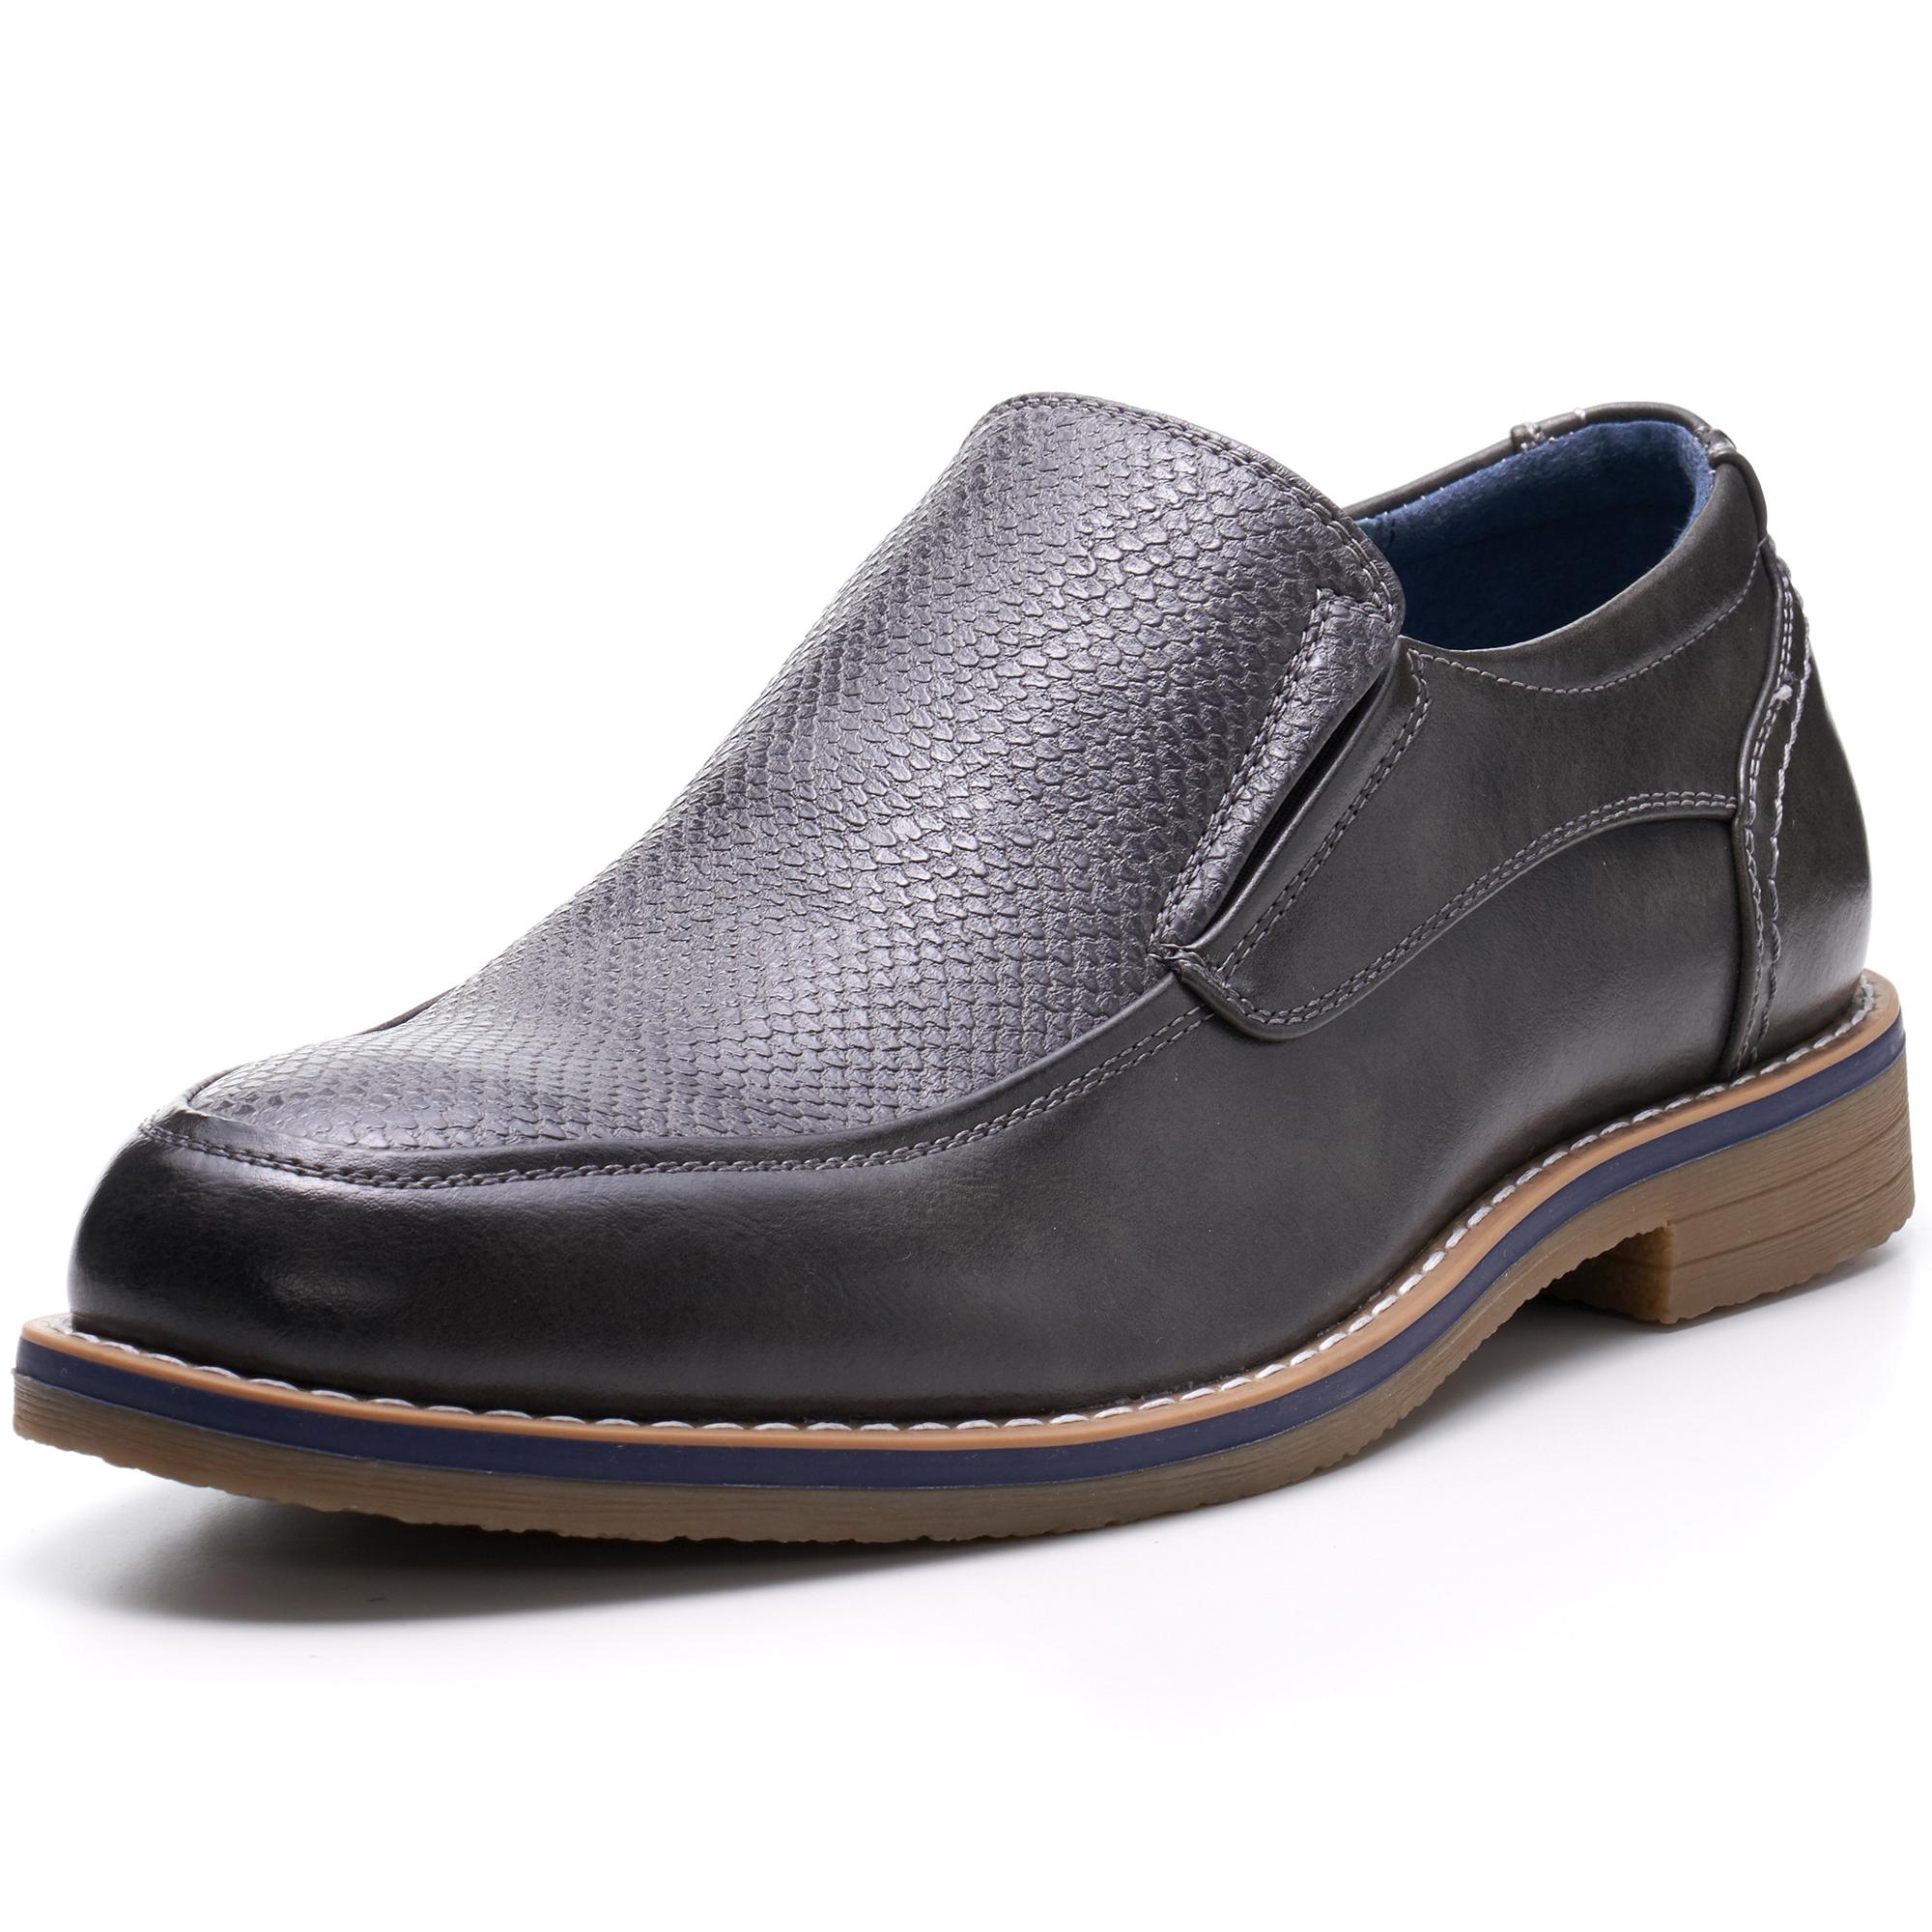 Alpine-Swiss-Carter-Men-s-Slip-On-Loafers-Snakeskin-Dress-Shoes-Leather-Lined